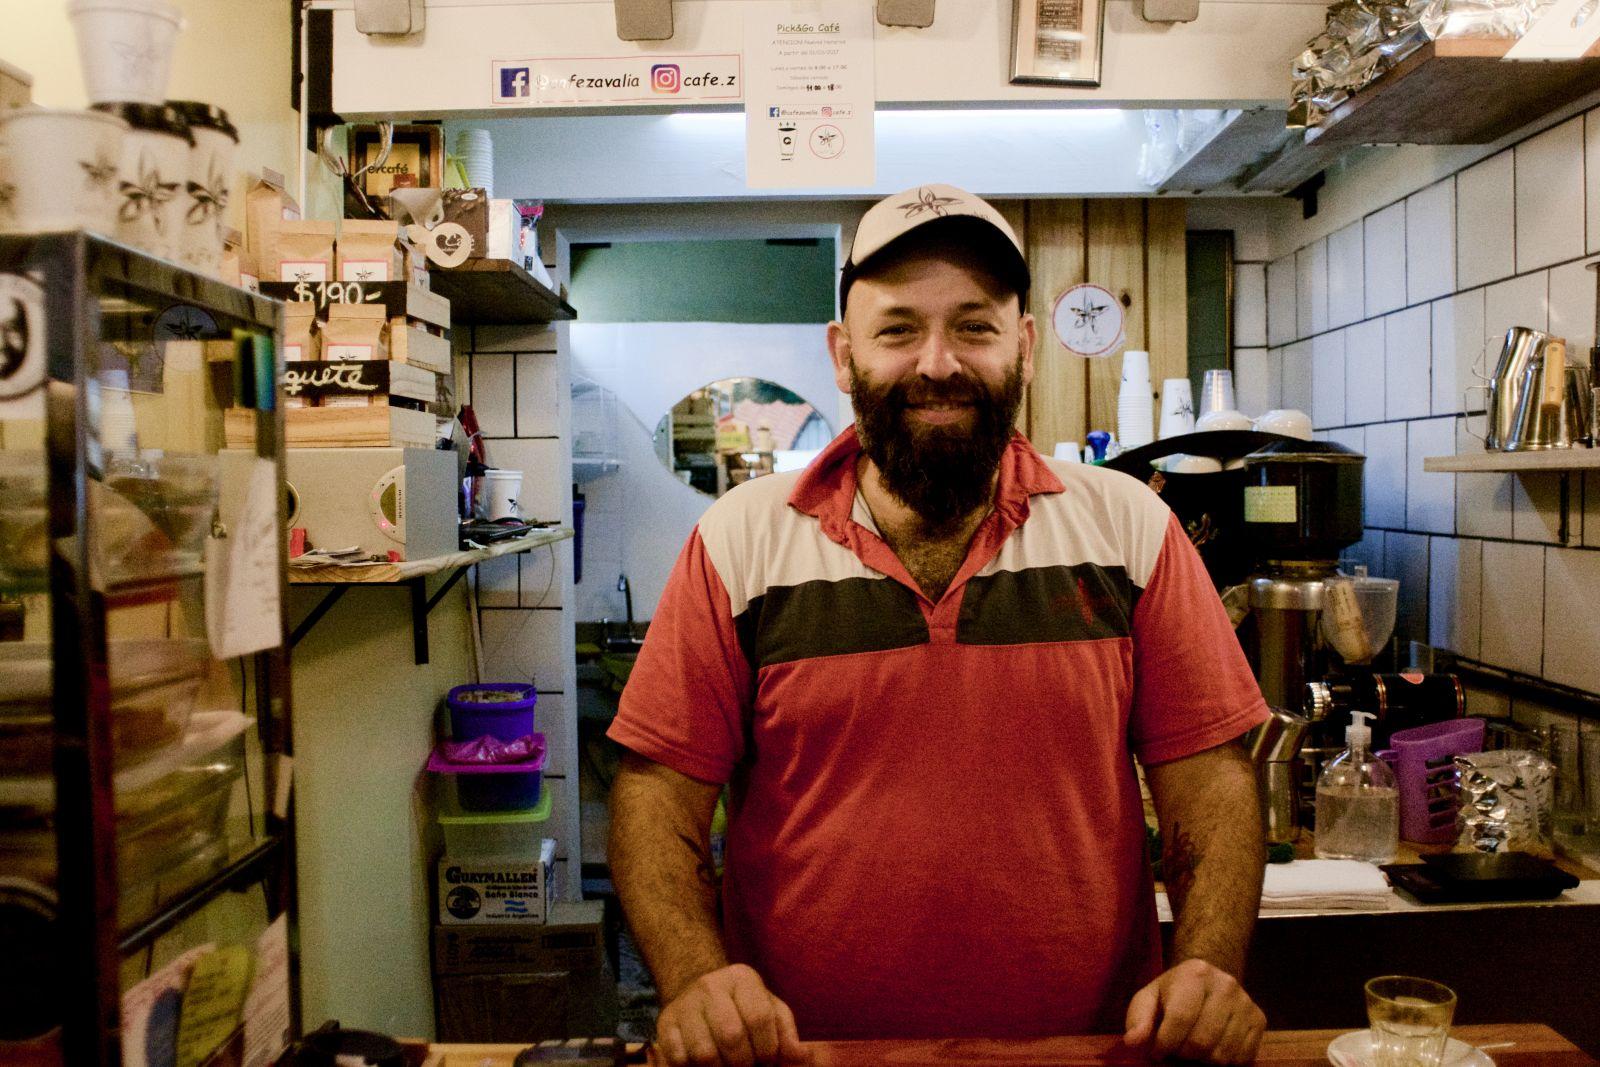 carlos-alberto-zavalia-cafe-z-buenos-aires